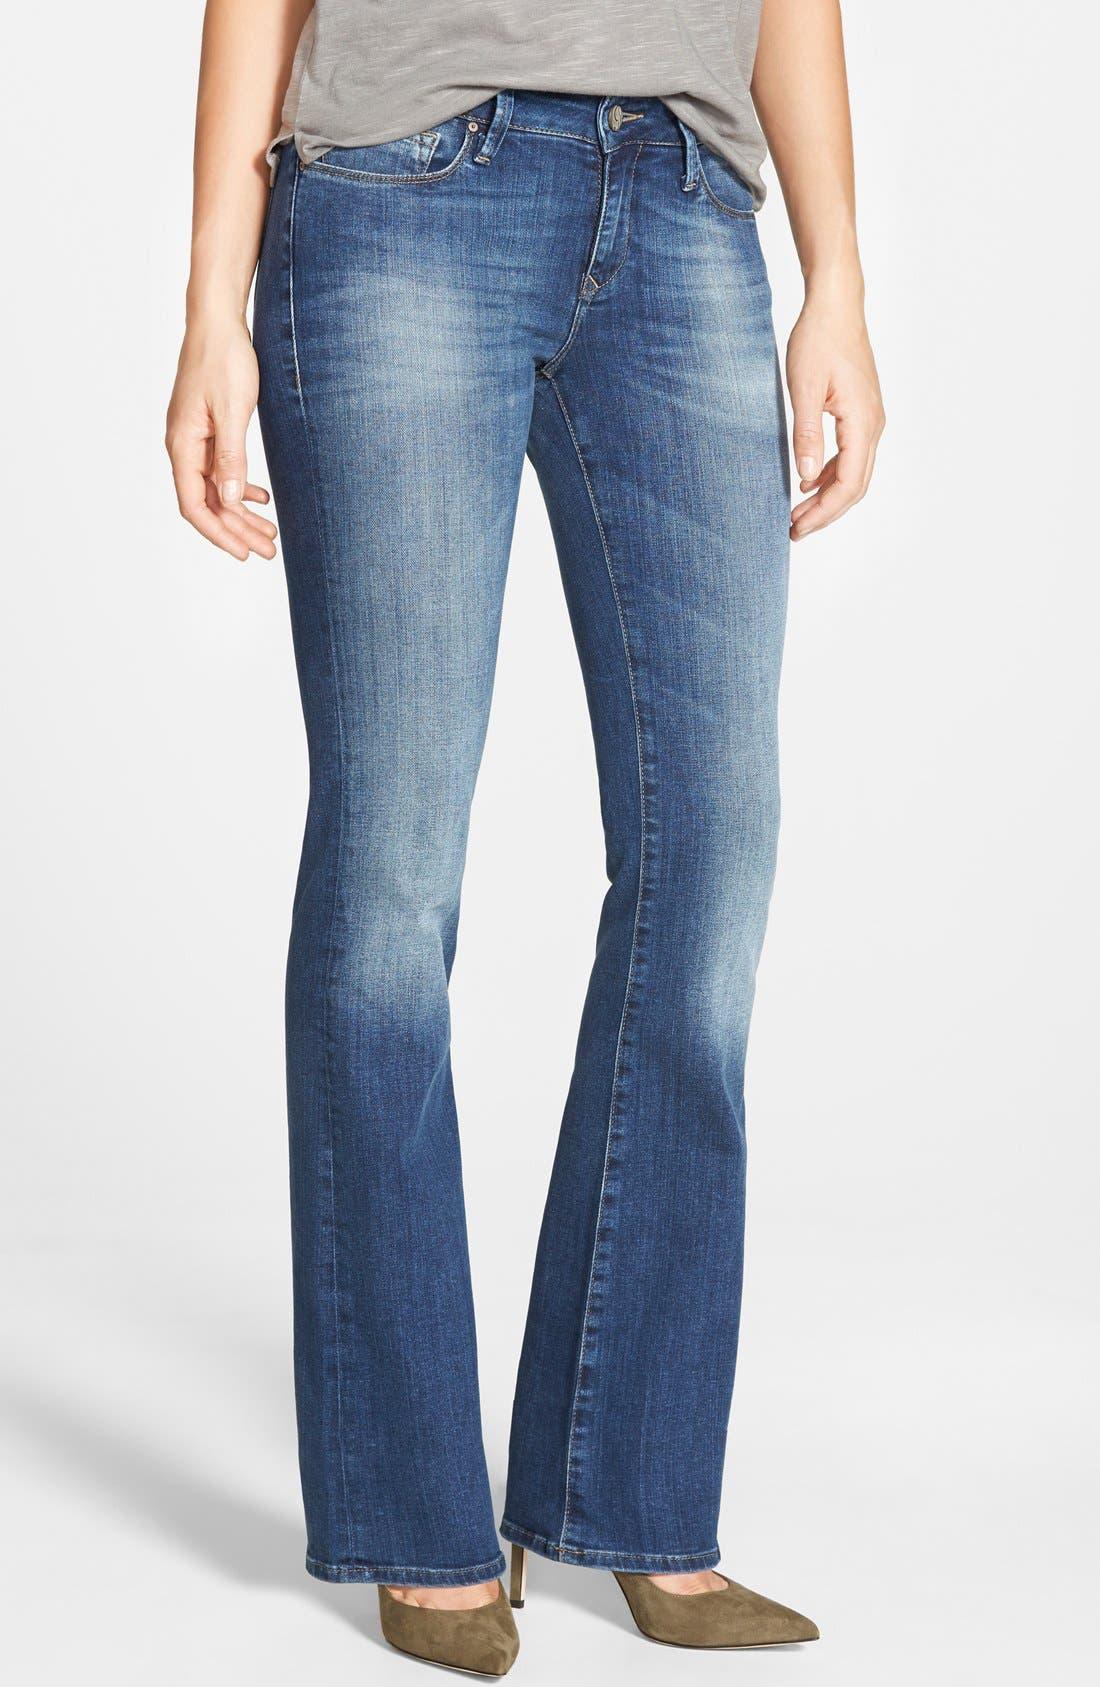 MAVI JEANS 'Ashley' Stretch Bootcut Jeans